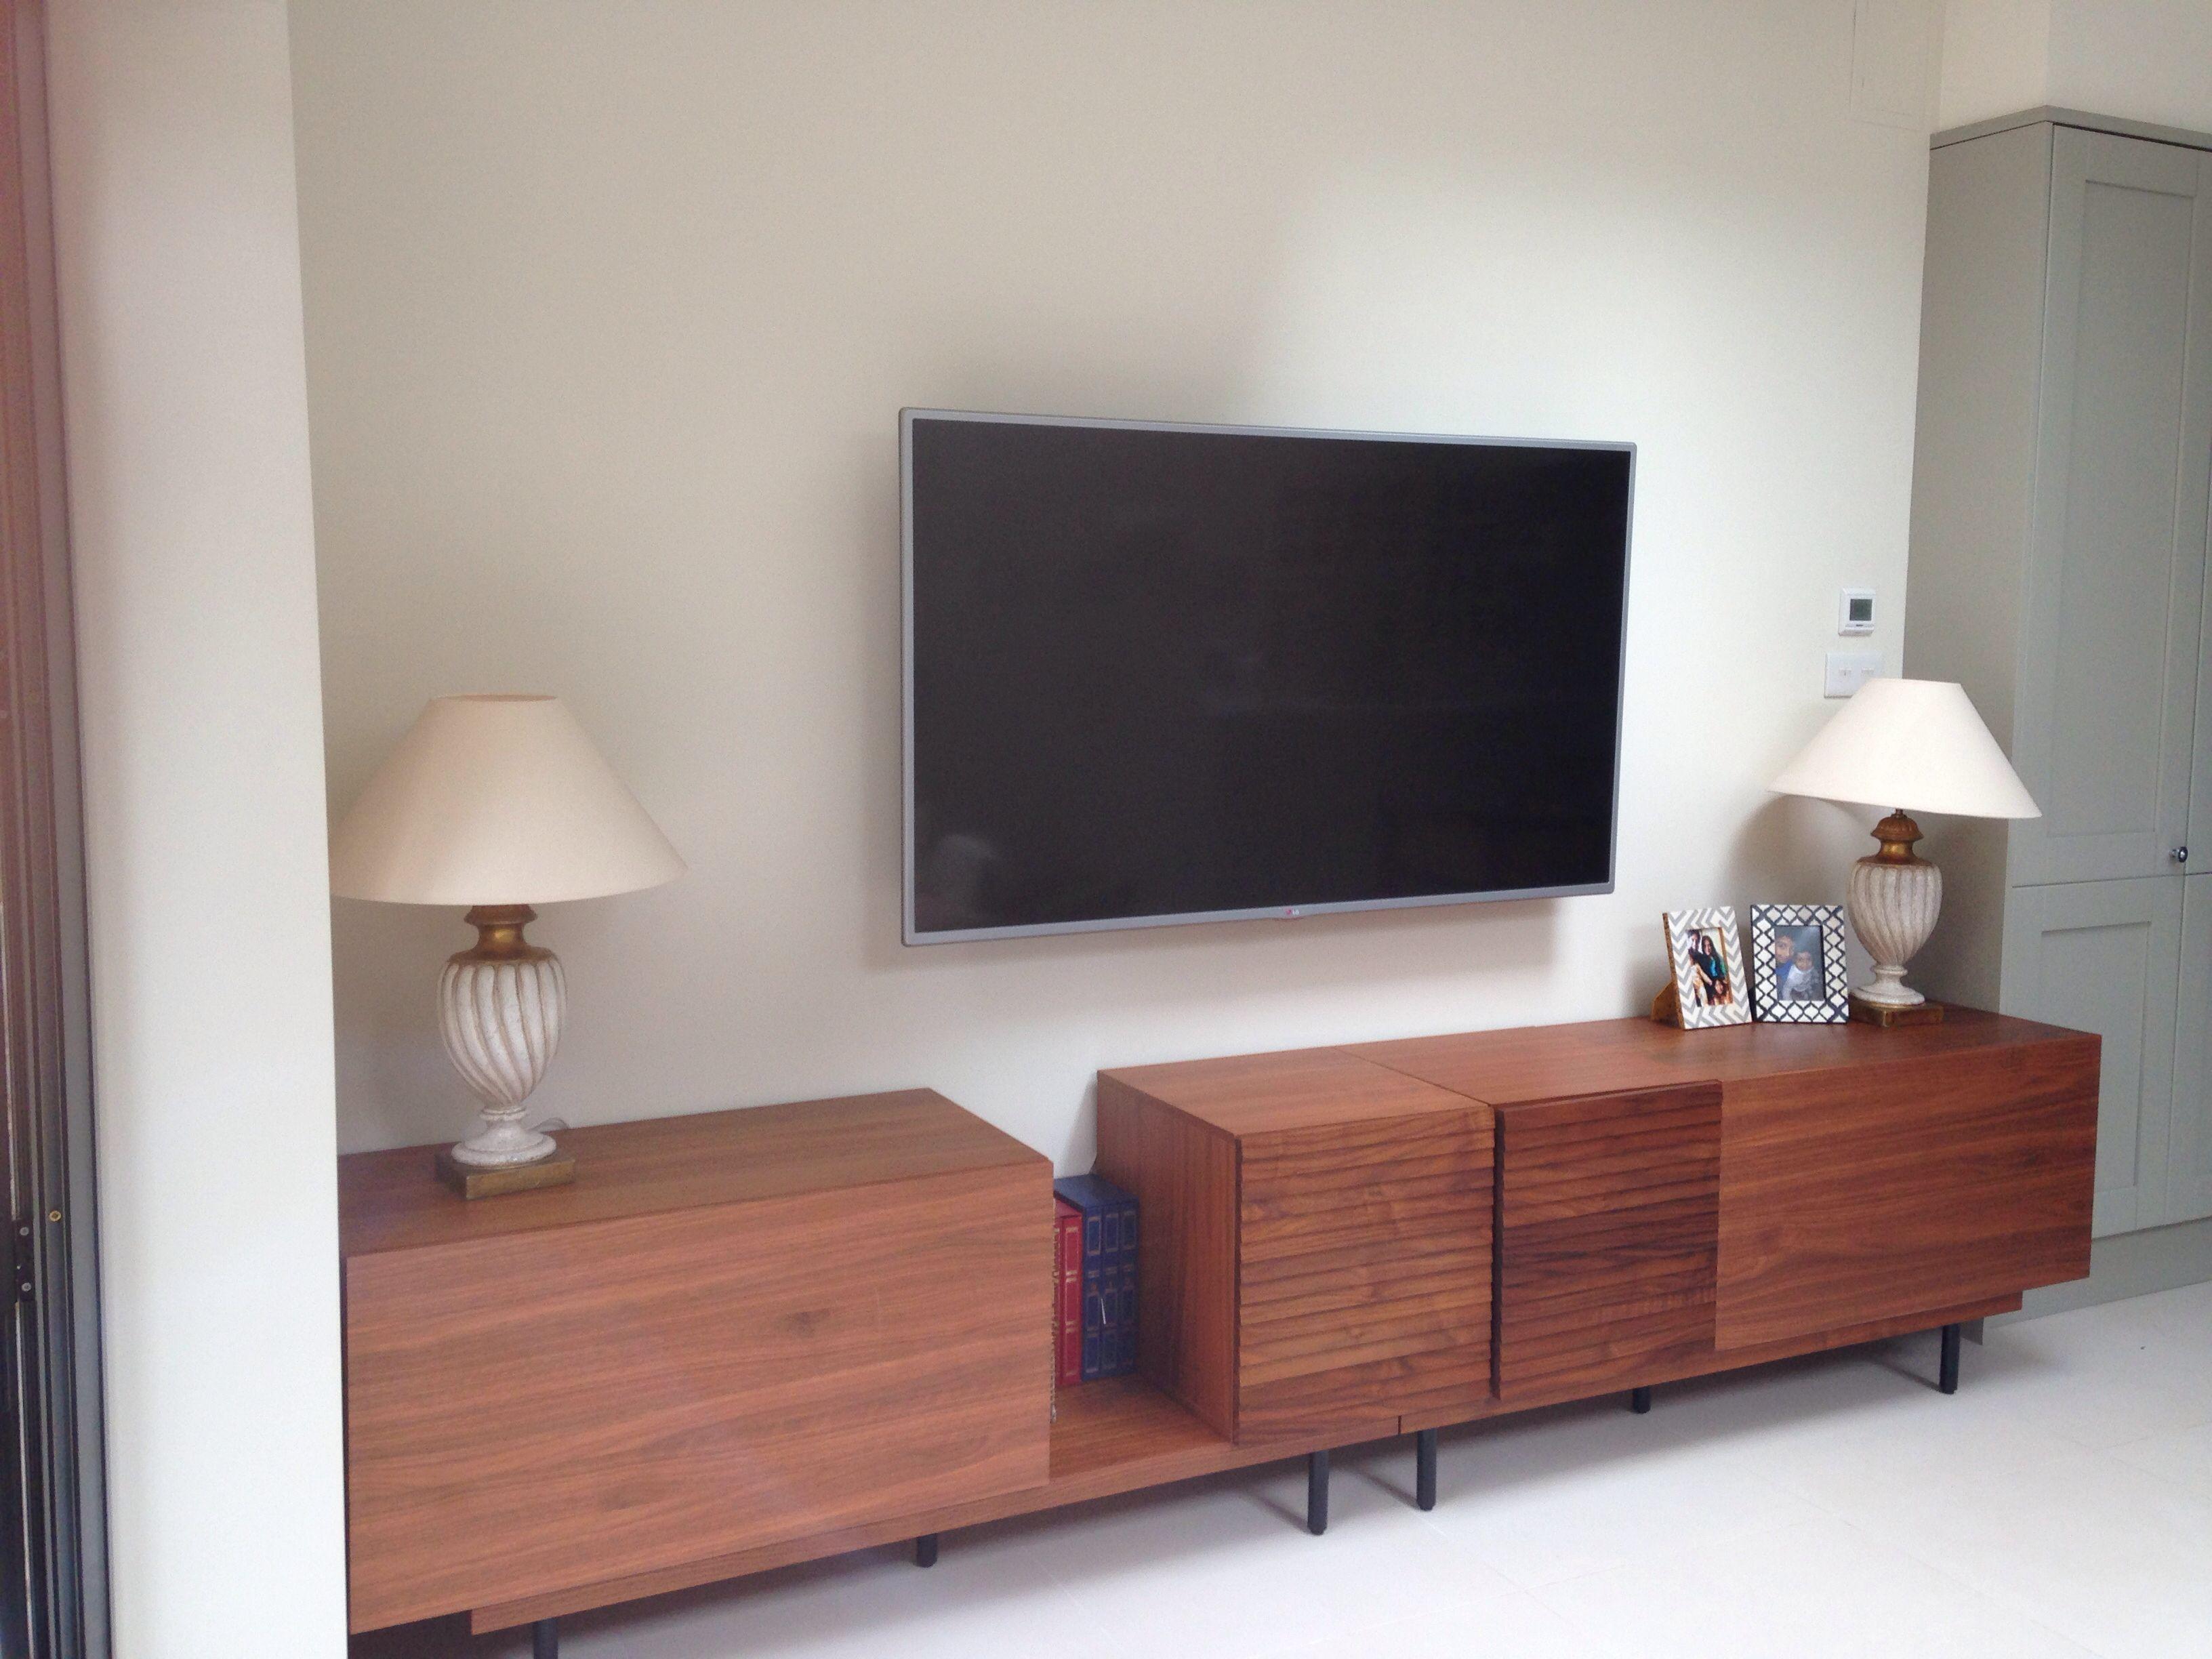 Habitat Bocksey Arranged As Kitchen Tv Stand Family Room Meuble Bas Deco Habitat